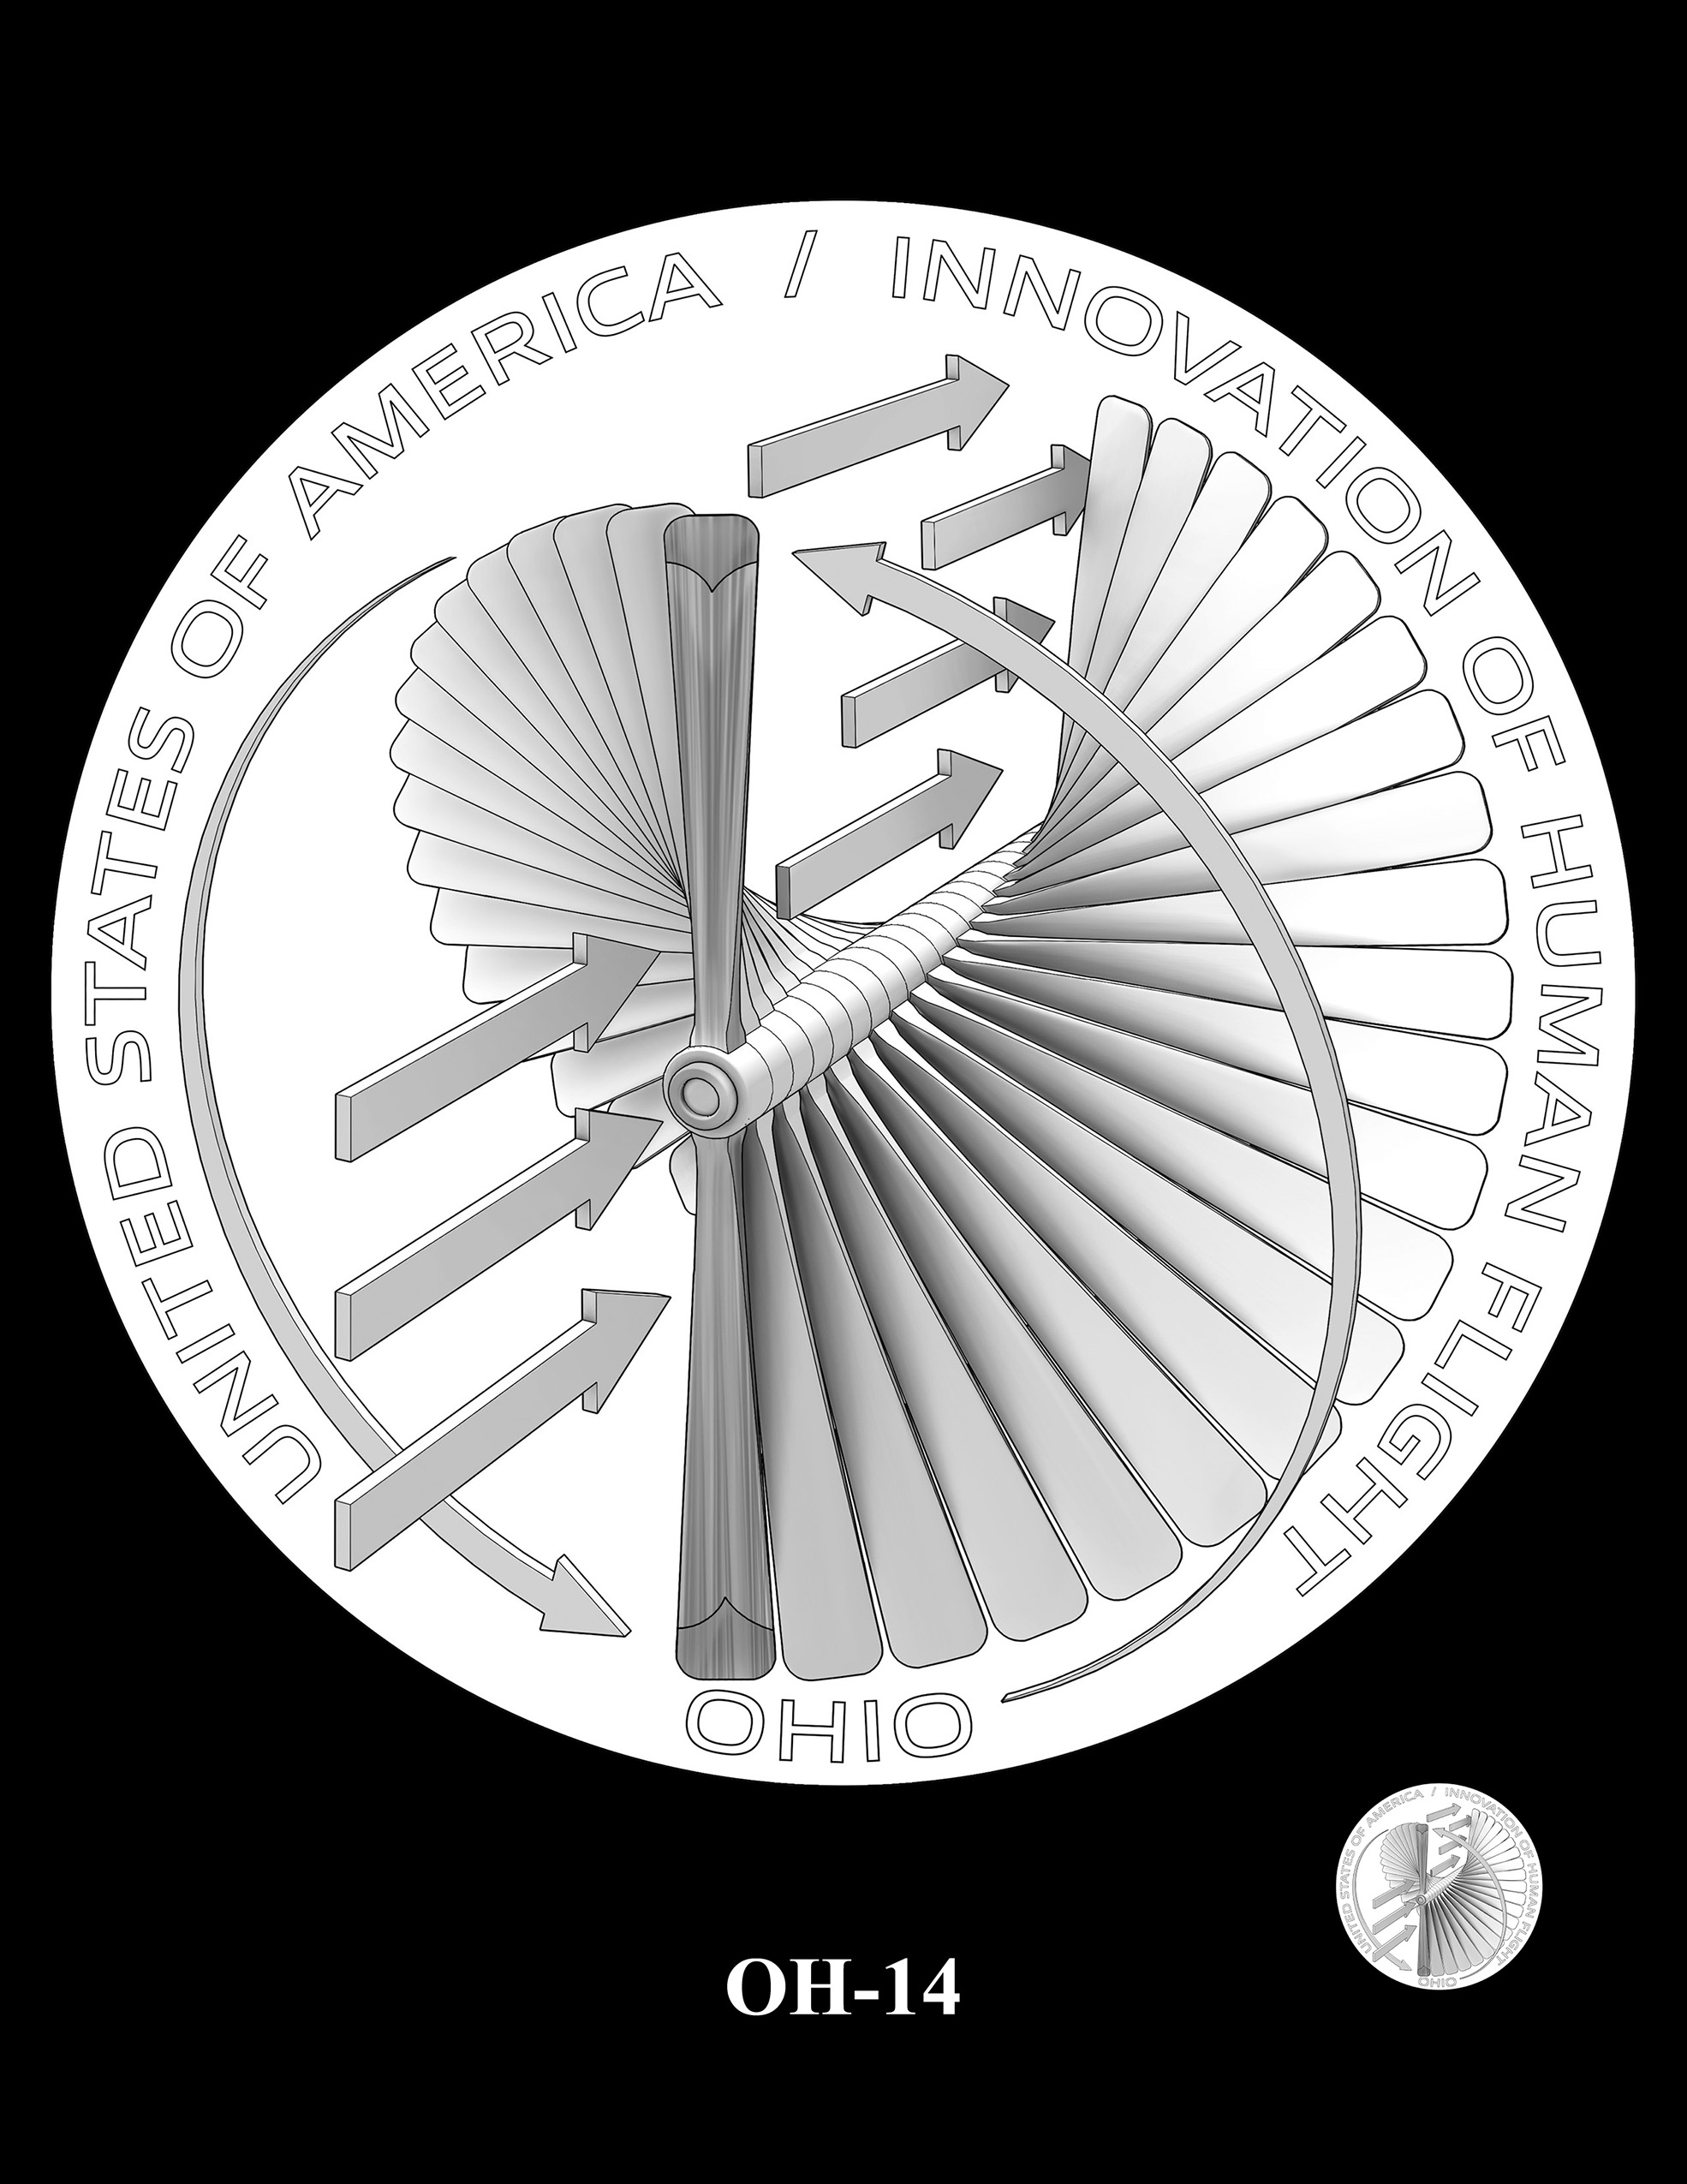 OH-14 -- 2023 American Innovation $1 Coin Program - Ohio